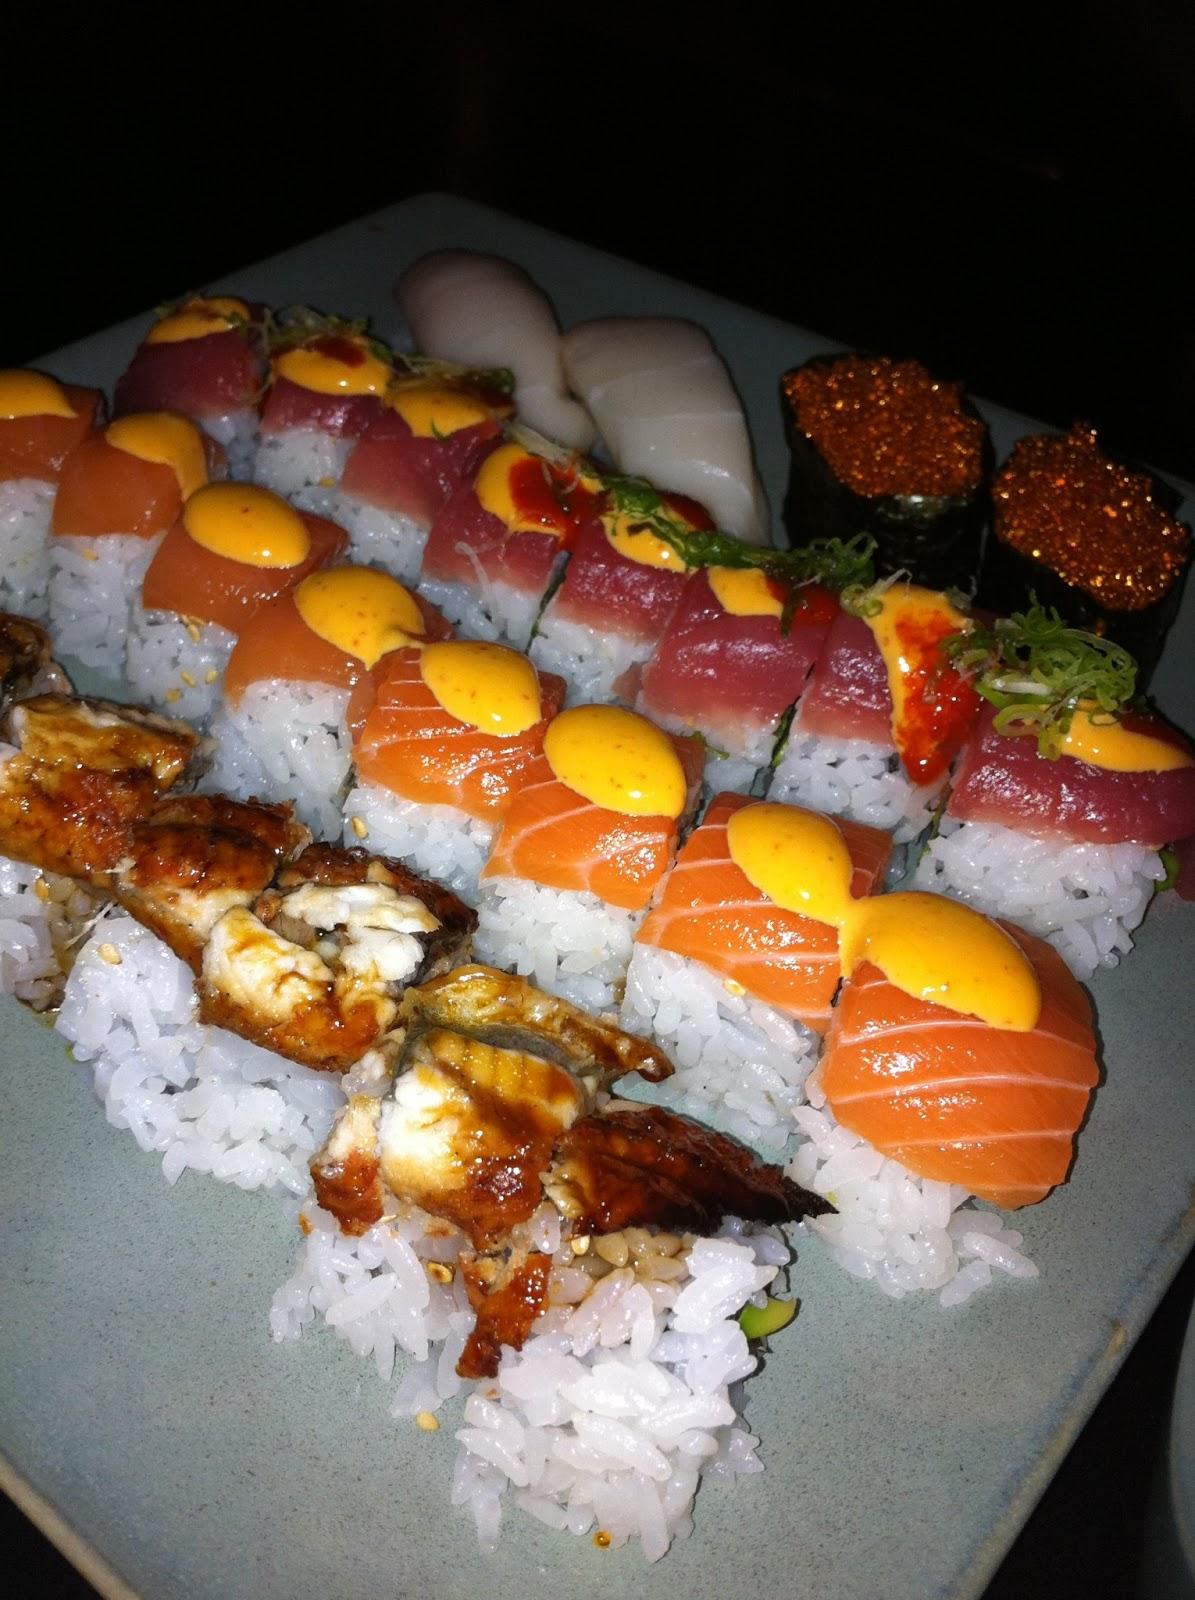 Origami Japanese Cuisine - Menu & Reviews - Round Rock 78681 | 1600x1195